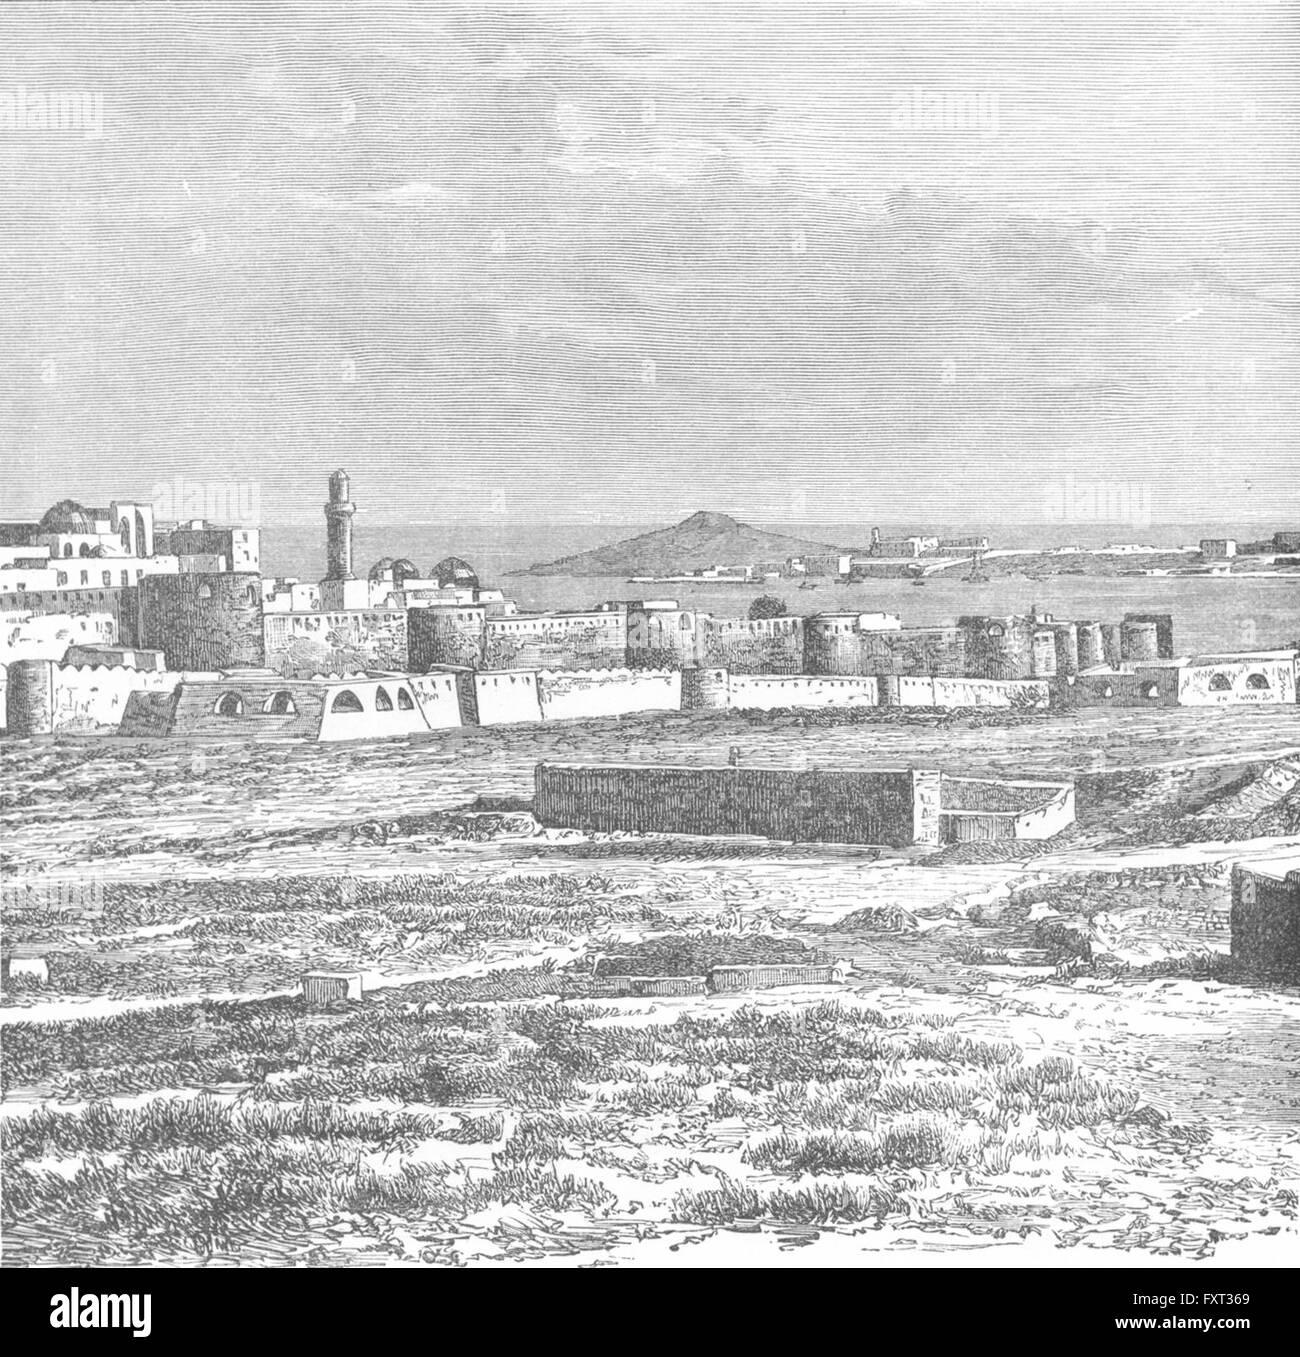 AZERBAIJAN: Baku & Cape Bail-Burni, antique print c1885 - Stock Image